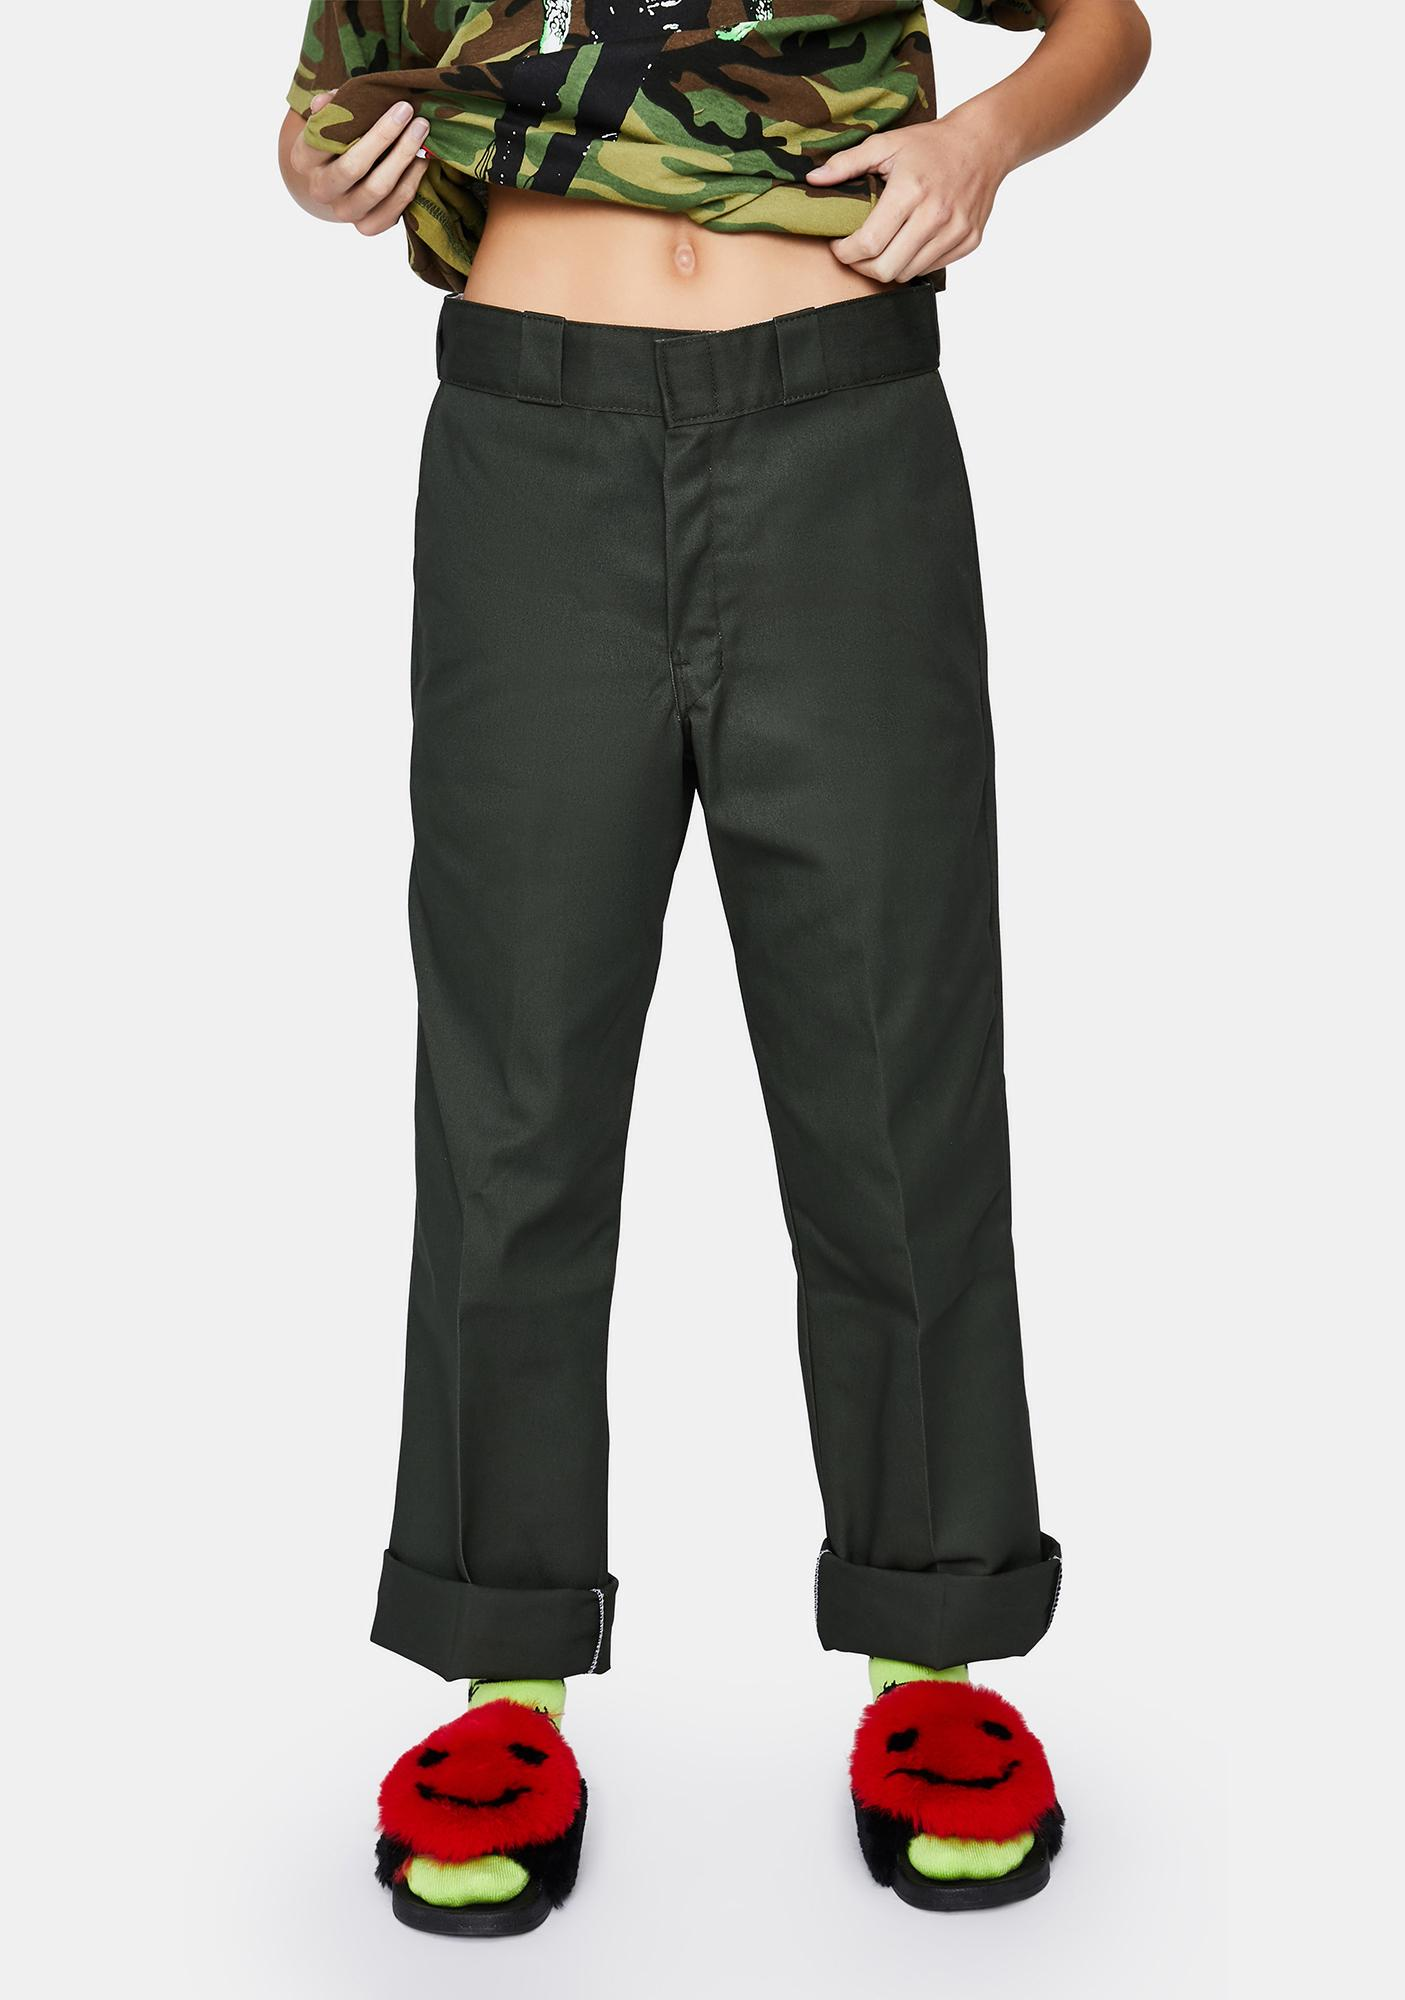 Dickies Olive Green Original 874 Work Pants